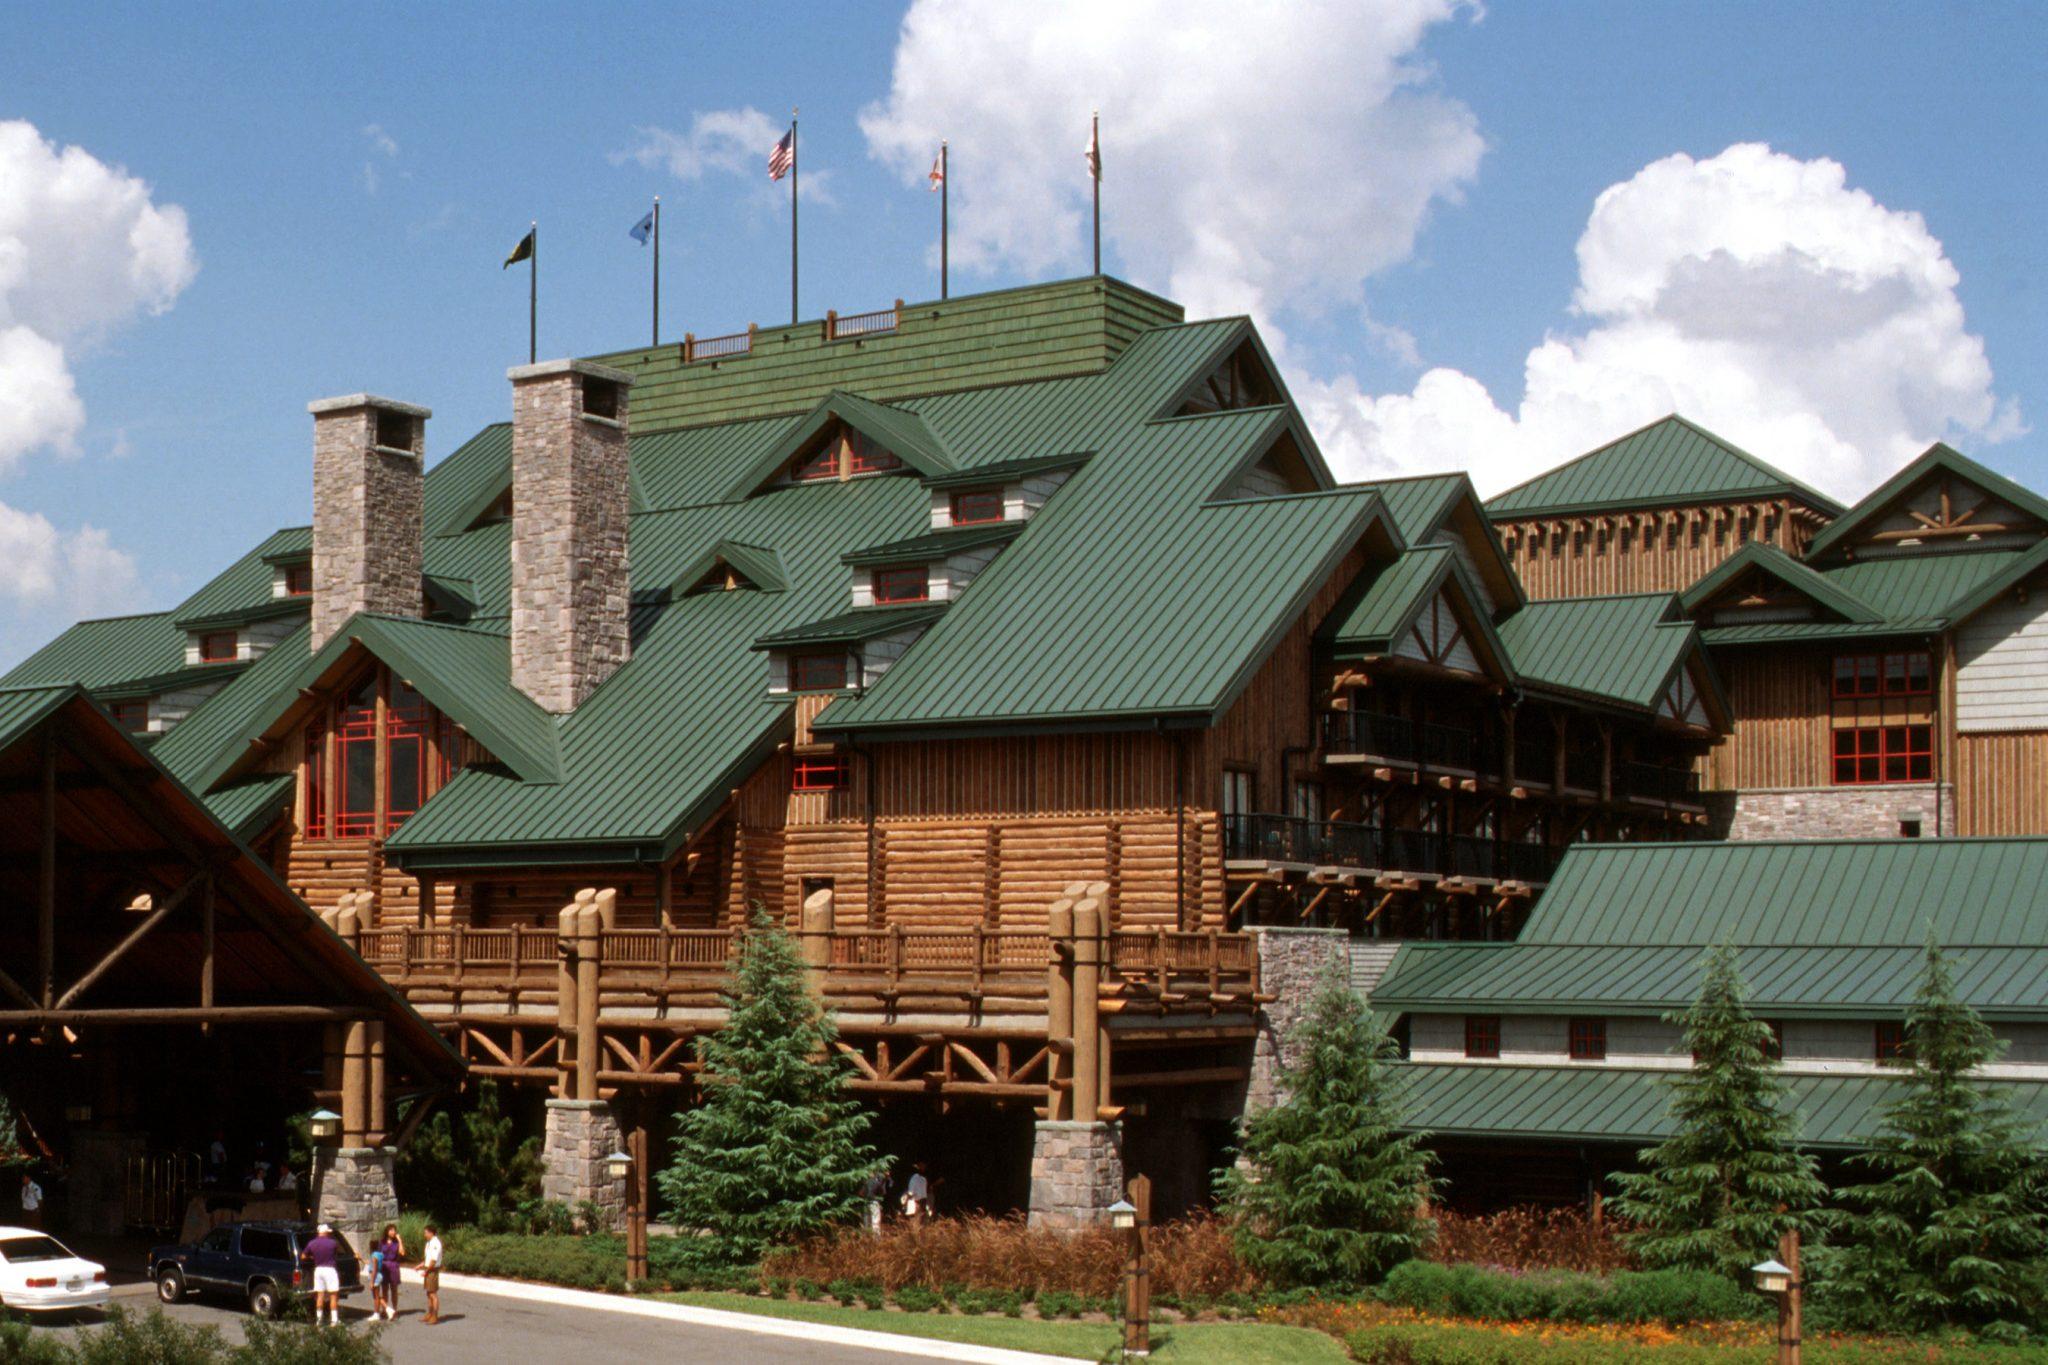 ResortLoop.com Episode 24 – Animal Kingdom Lodge vs Wilderness Lodge